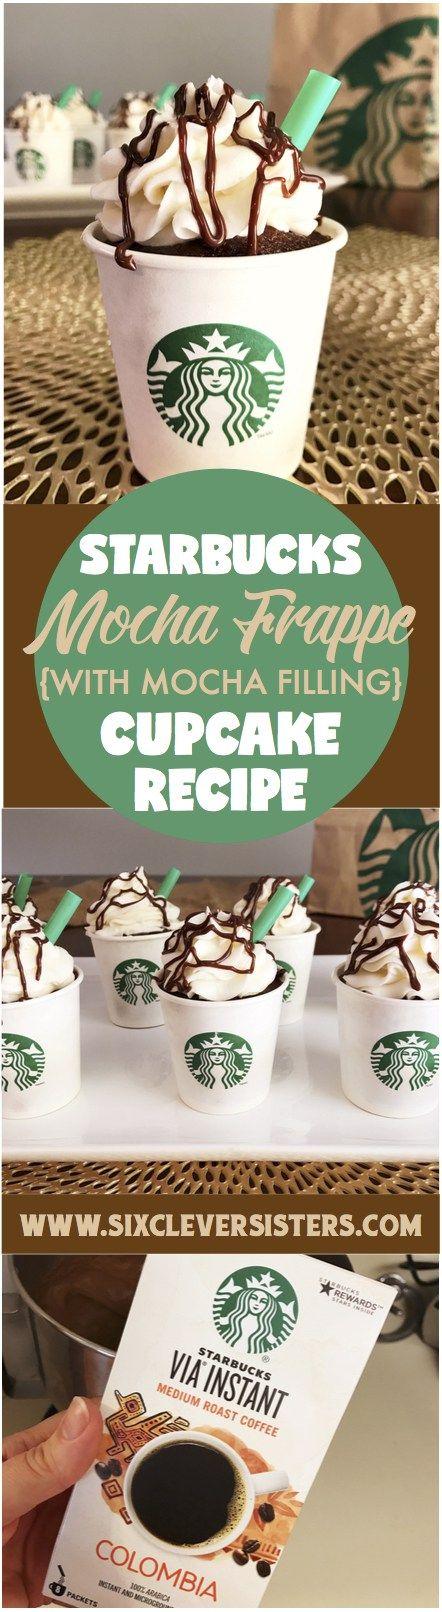 how to make starbucks mocha coffee